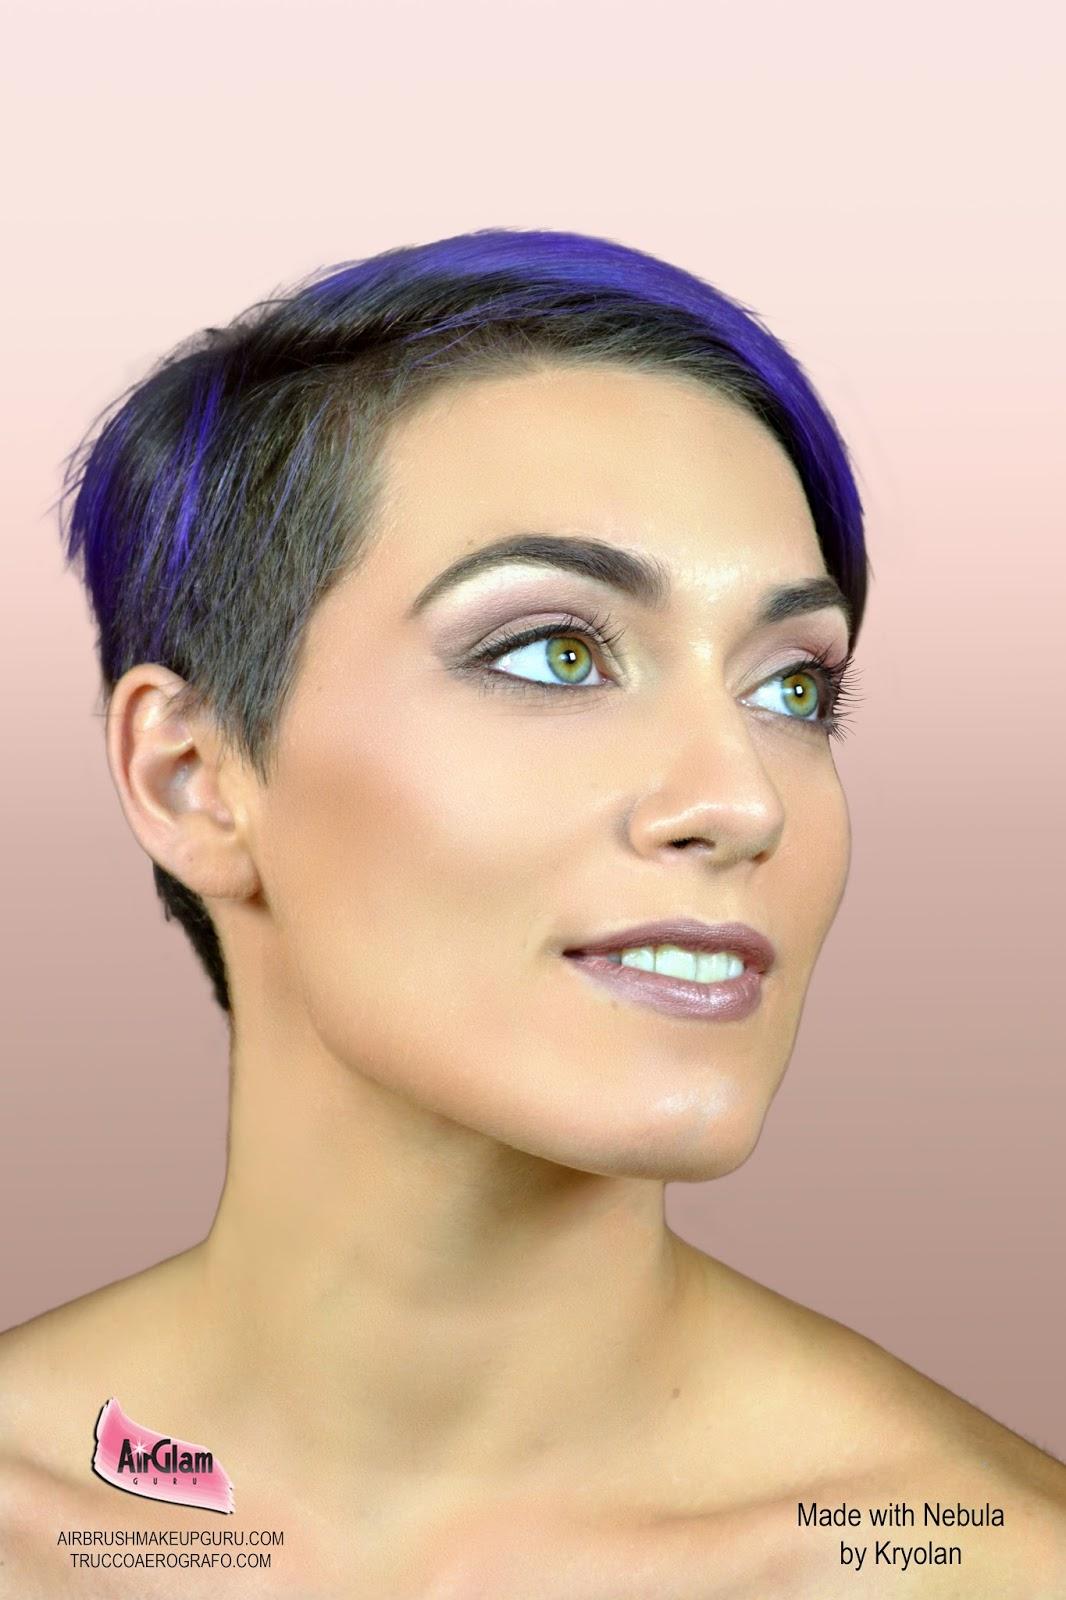 Airbrush Bridal Makeup Reviews : The Airbrush Makeup Guru: How to achieve an INDESTRUCTIBLE ...